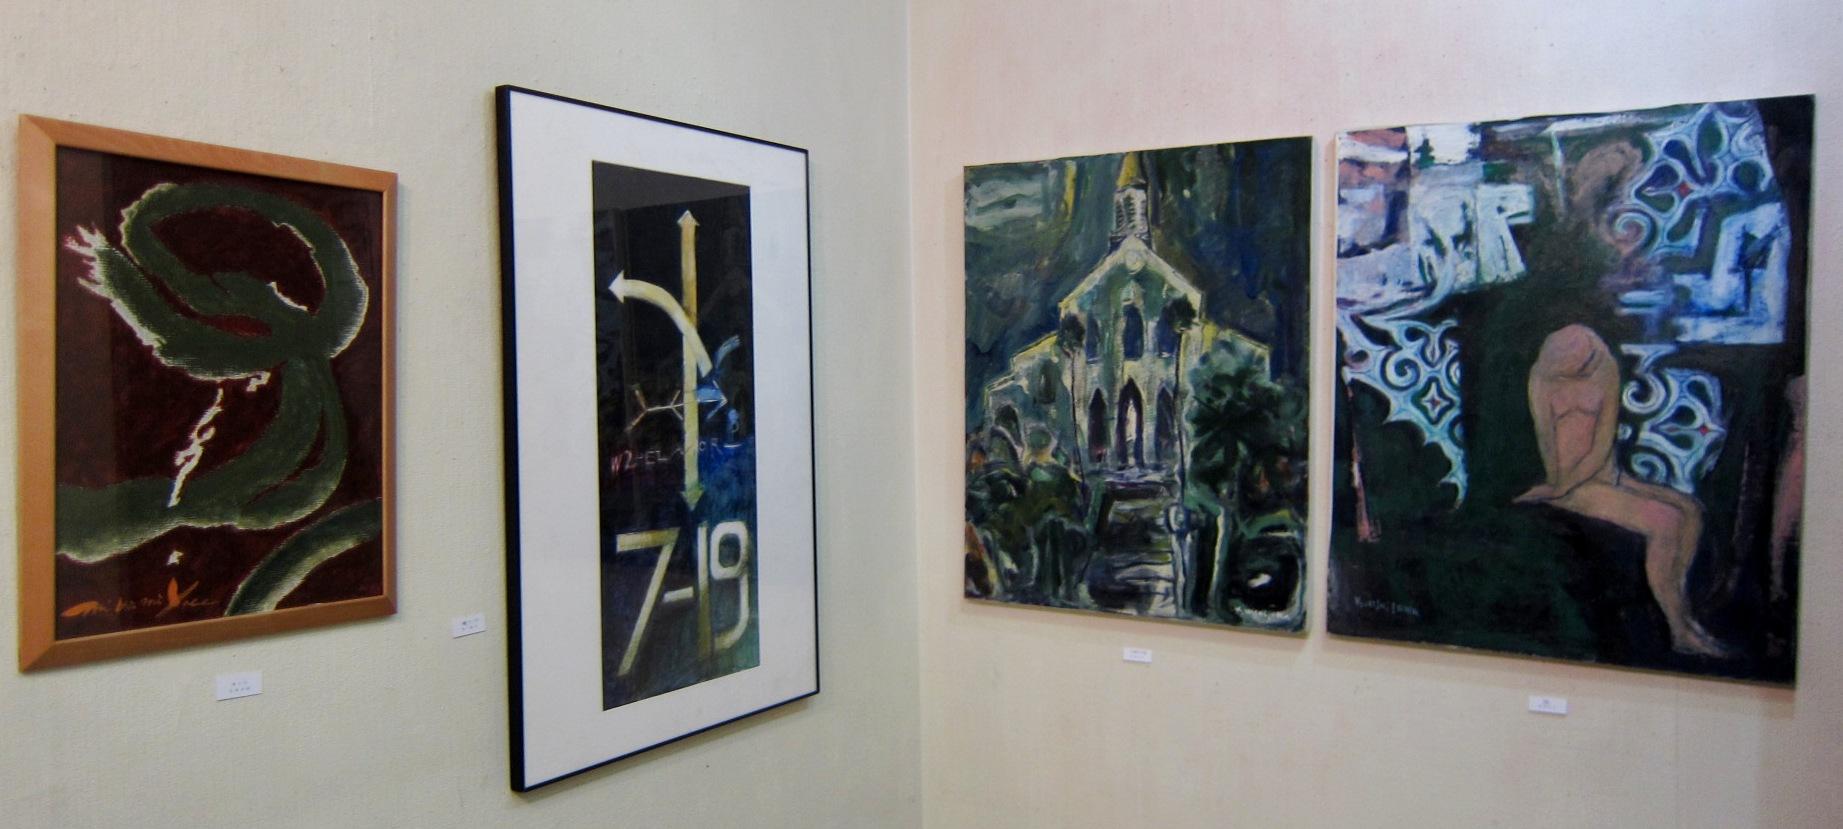 2354) 「LA`TAPIO -Ⅱ- Exhibition」 たぴお 1月27日(月)~2月15日(土)_f0126829_1171397.jpg